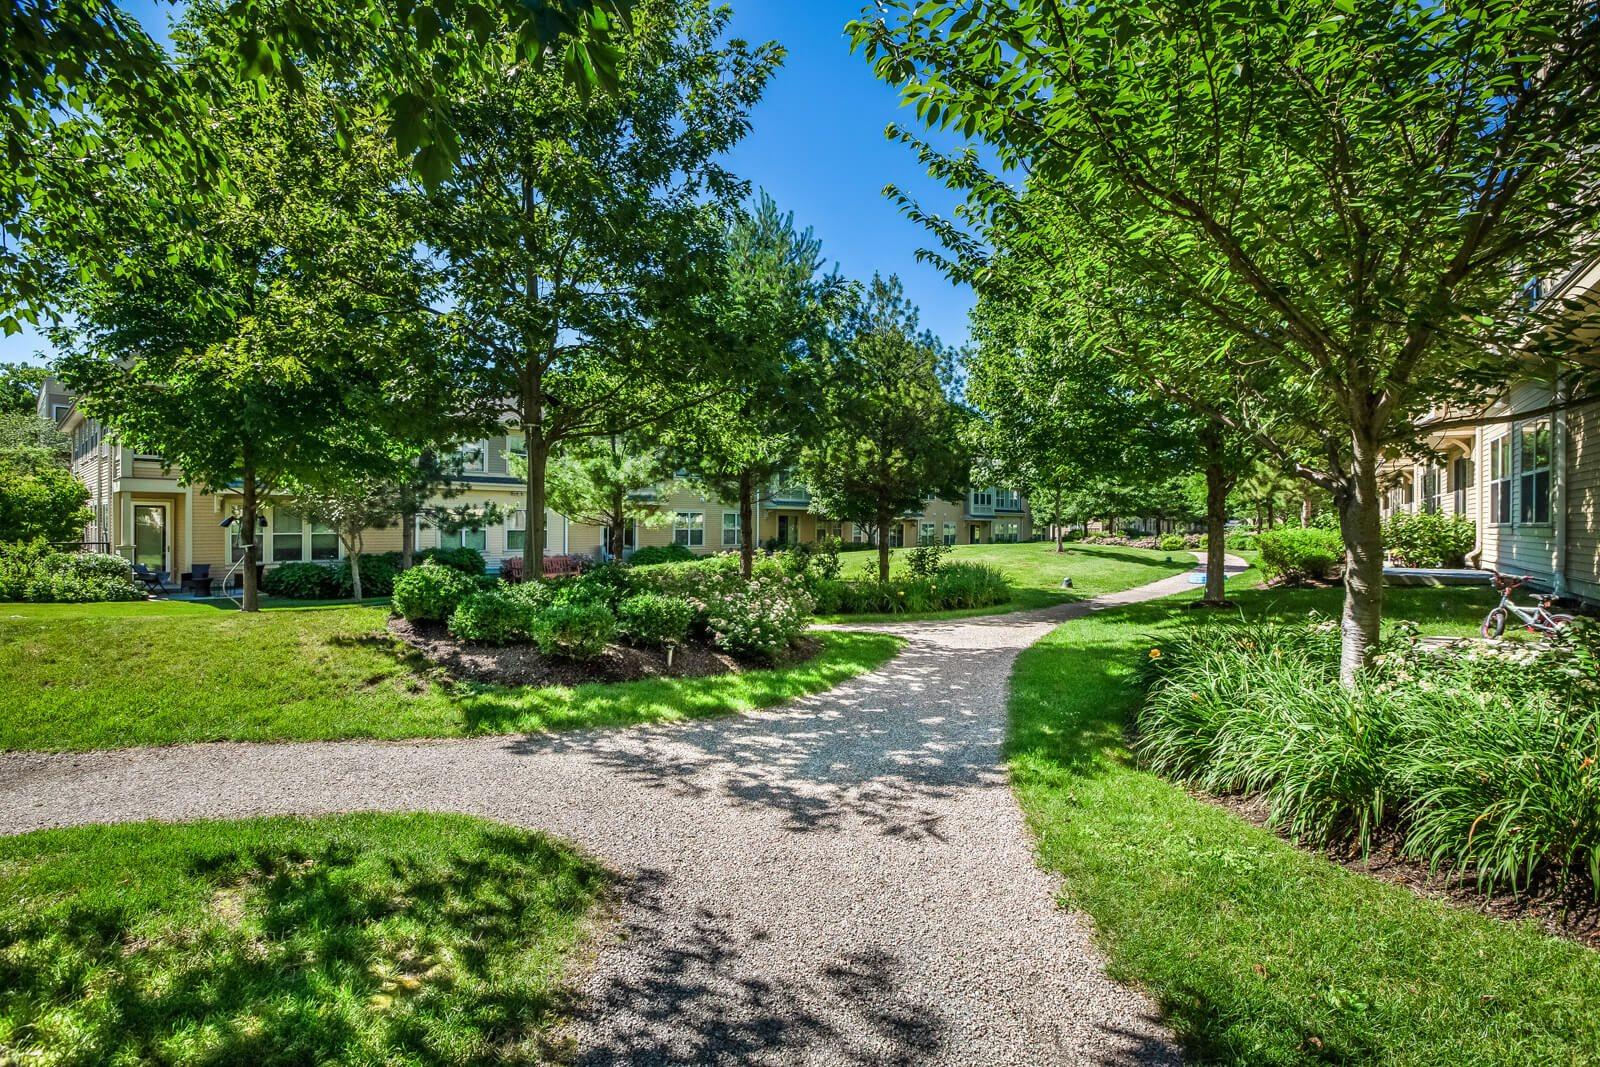 Plentiful Green Spaces at Oak Grove, 12 Island Hill Ave., MA